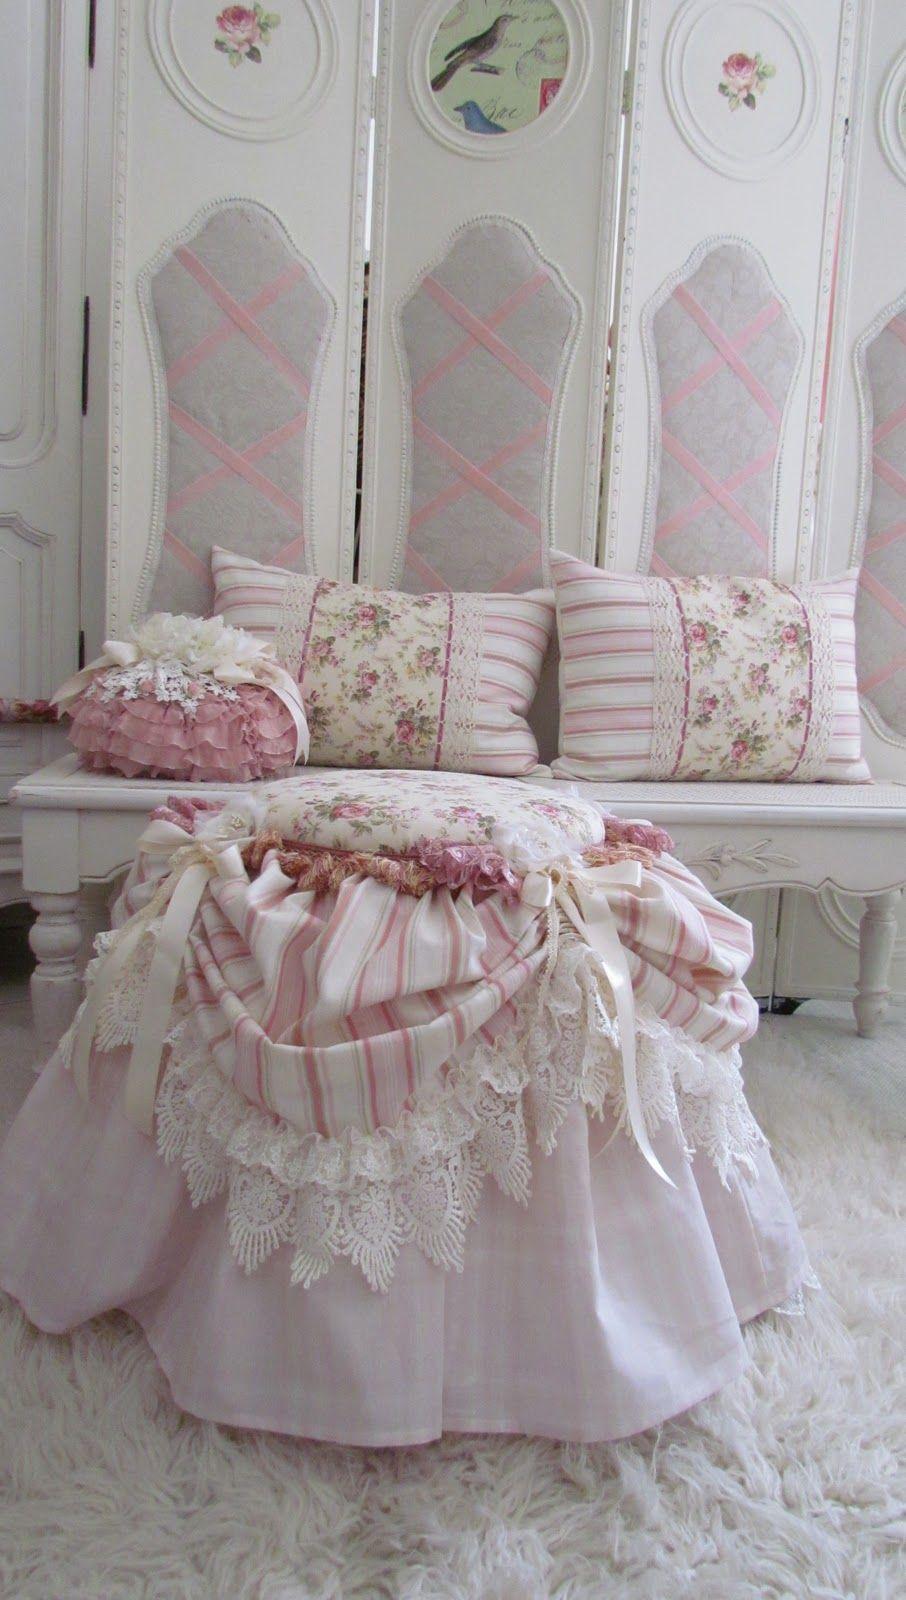 angela lace shabby chic pinterest nappes marguerite et fourniture. Black Bedroom Furniture Sets. Home Design Ideas